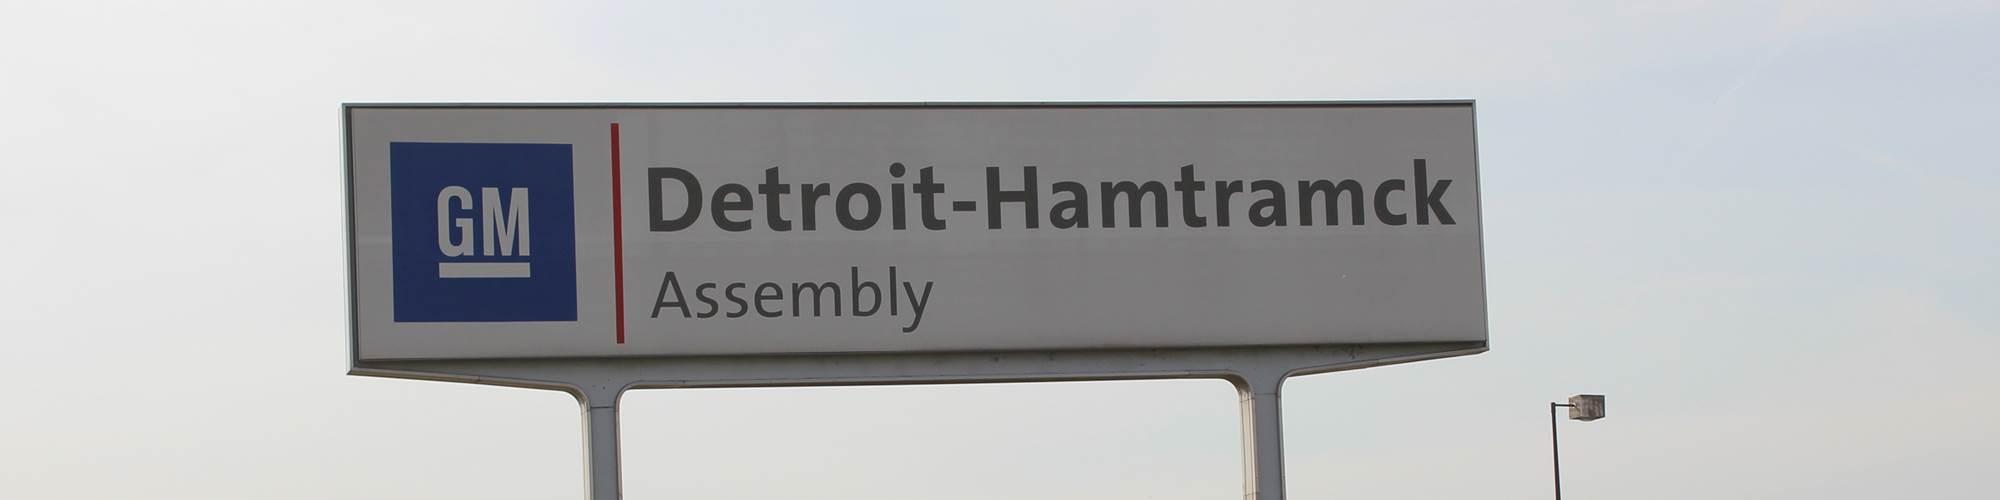 GM Detroit-Hamtramck plant